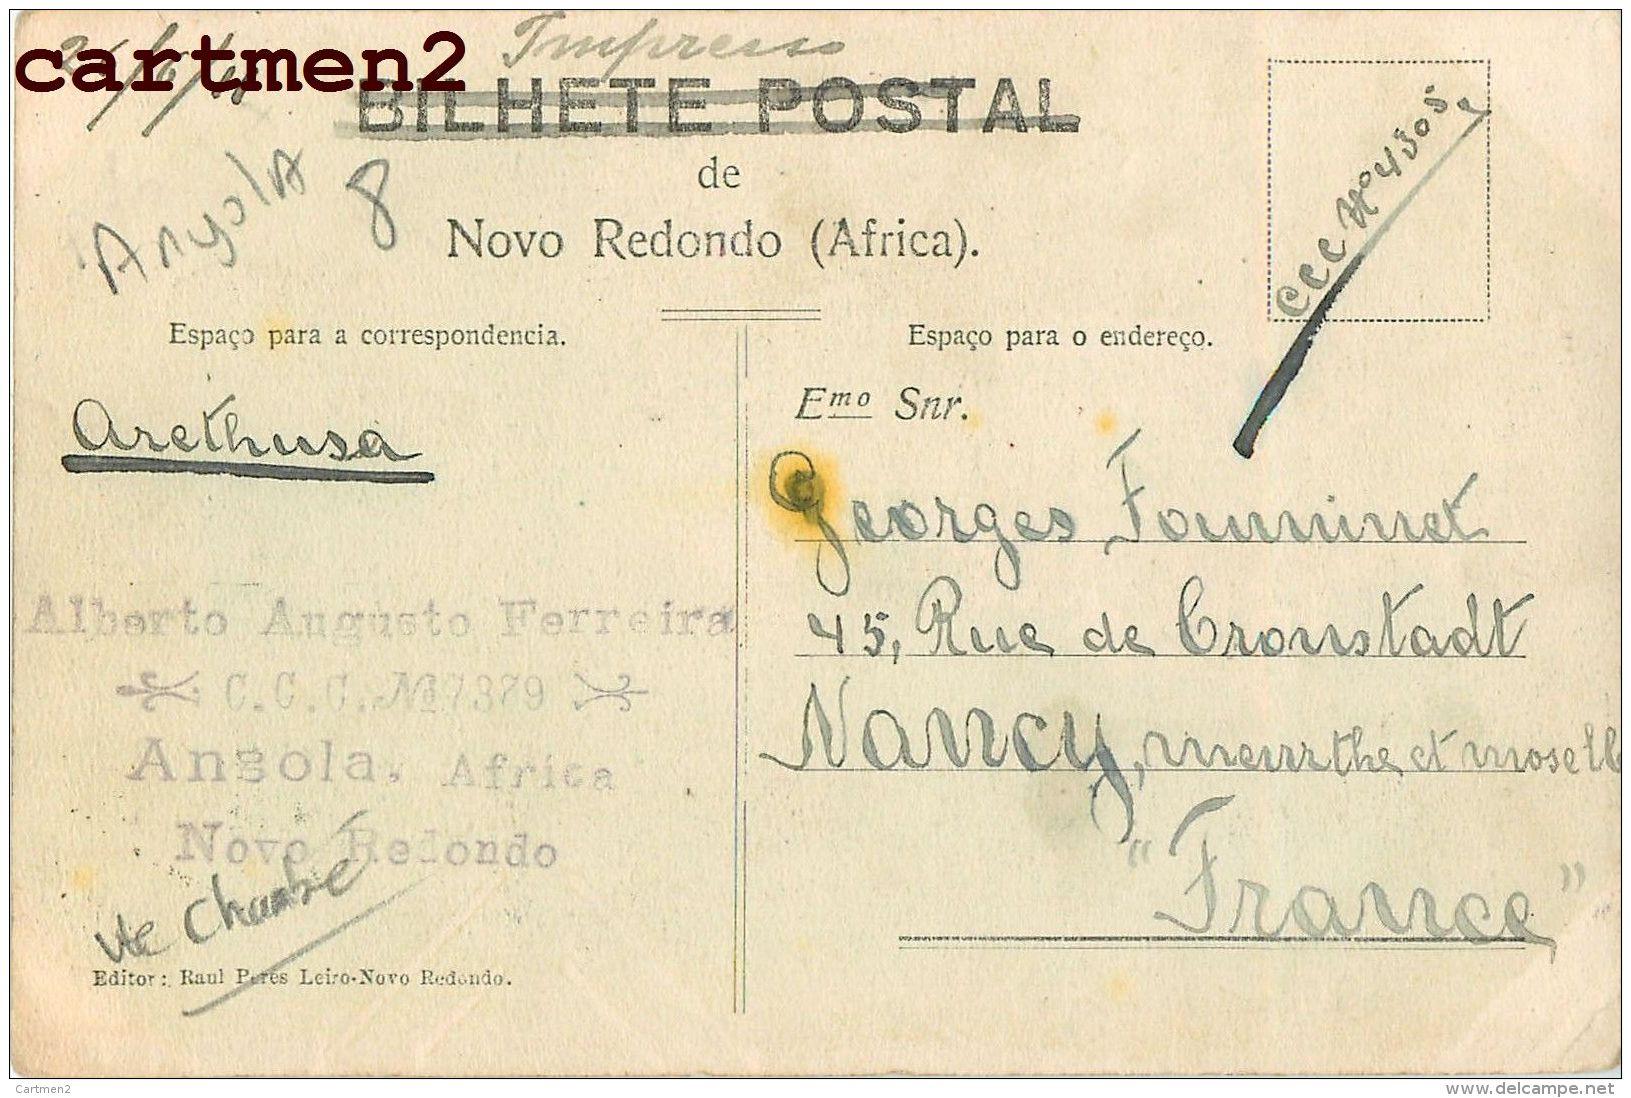 ANGOLA RUA DE SANT'ANTONIO PORTUGAL AFRIQUE - Angola